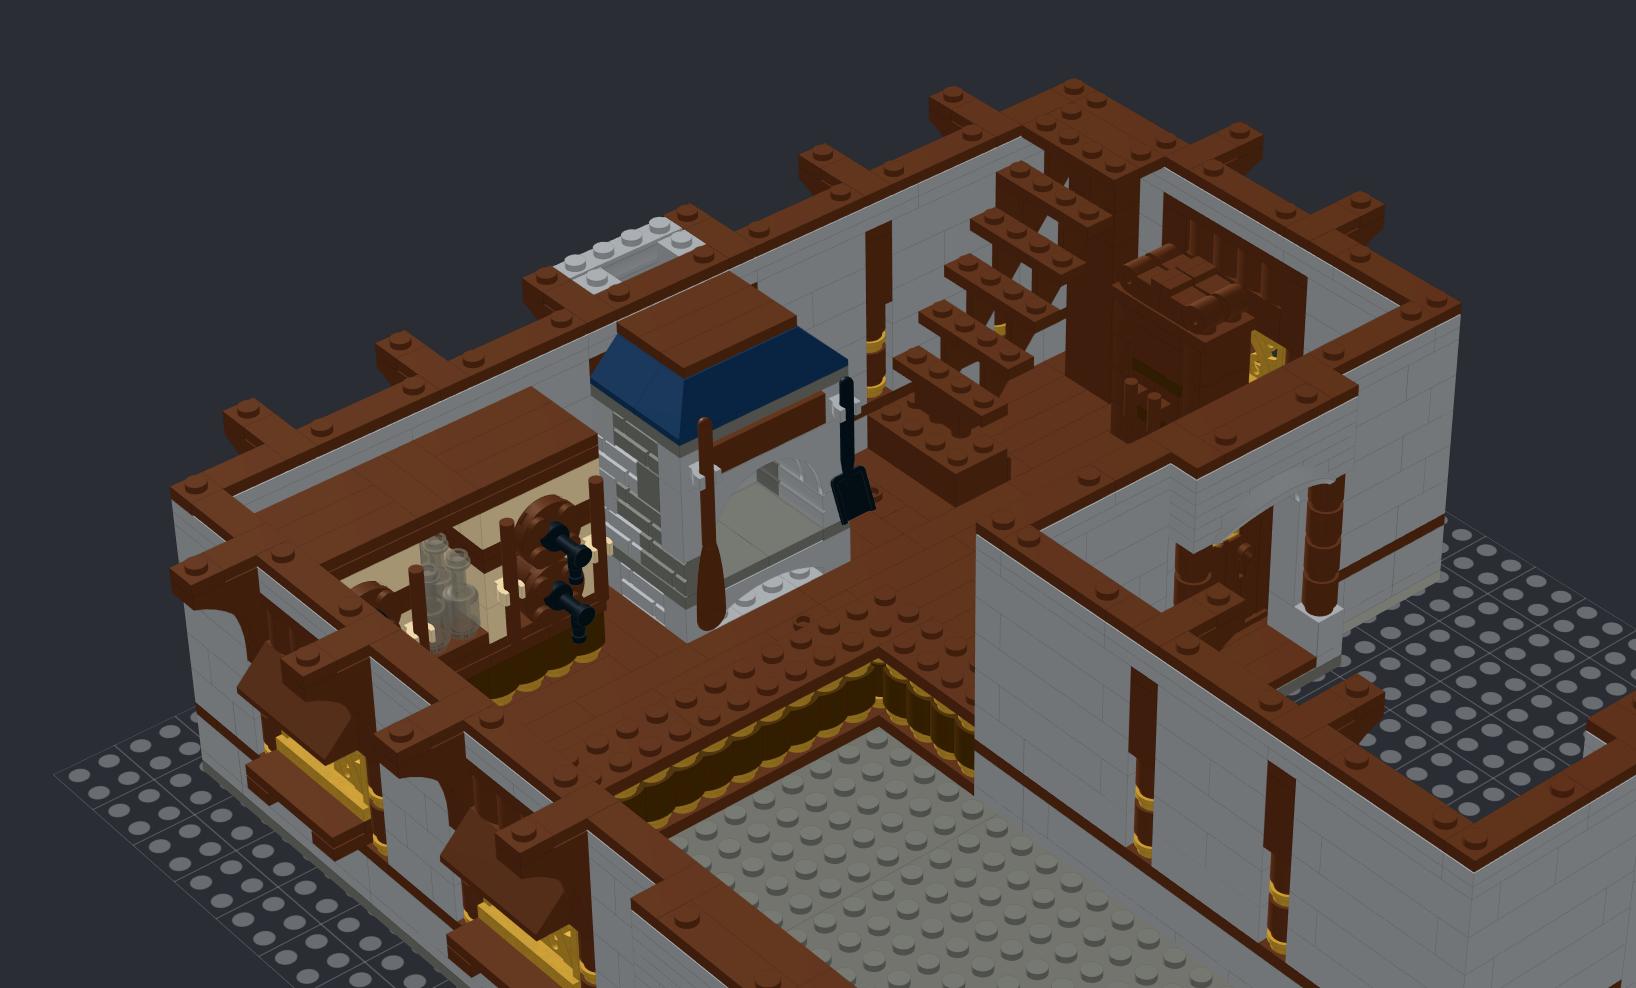 Tavern_02.PNG